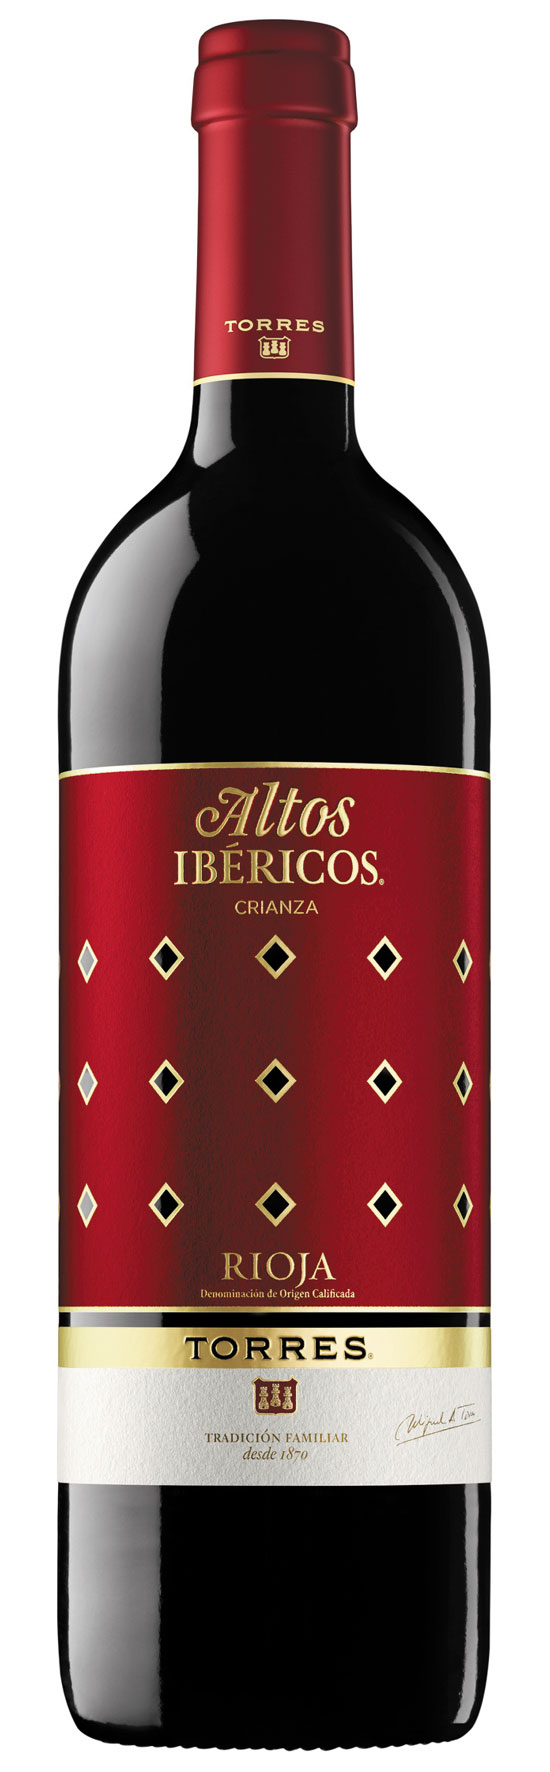 Torres Altos Ibéricos Crianza Rioja 2016